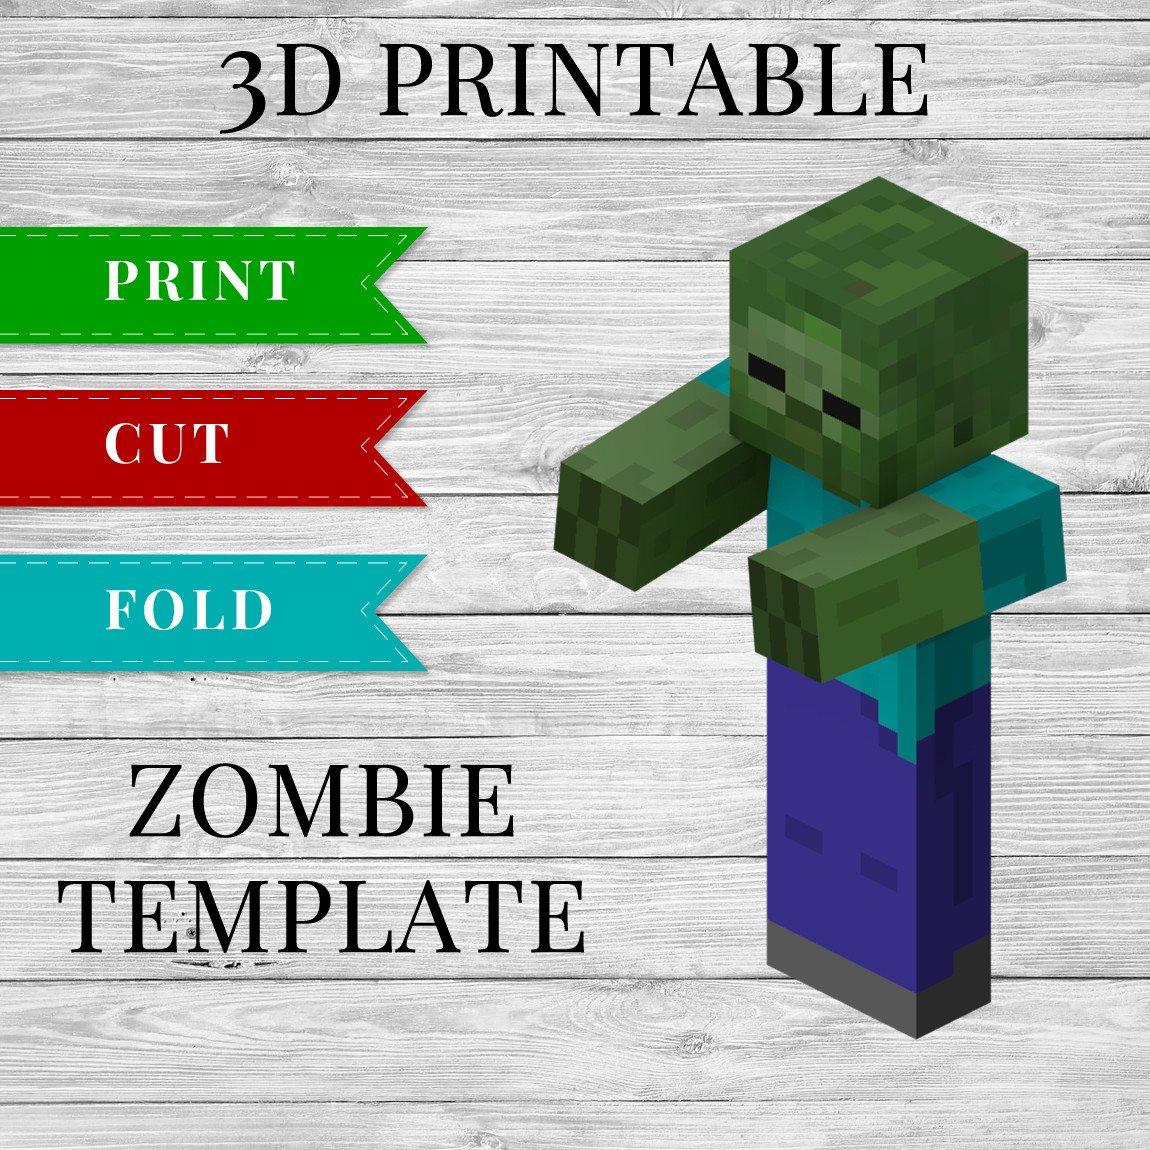 Minecraft Zombie Template Zombie Printable Minecraft Zombie Papercraft Template